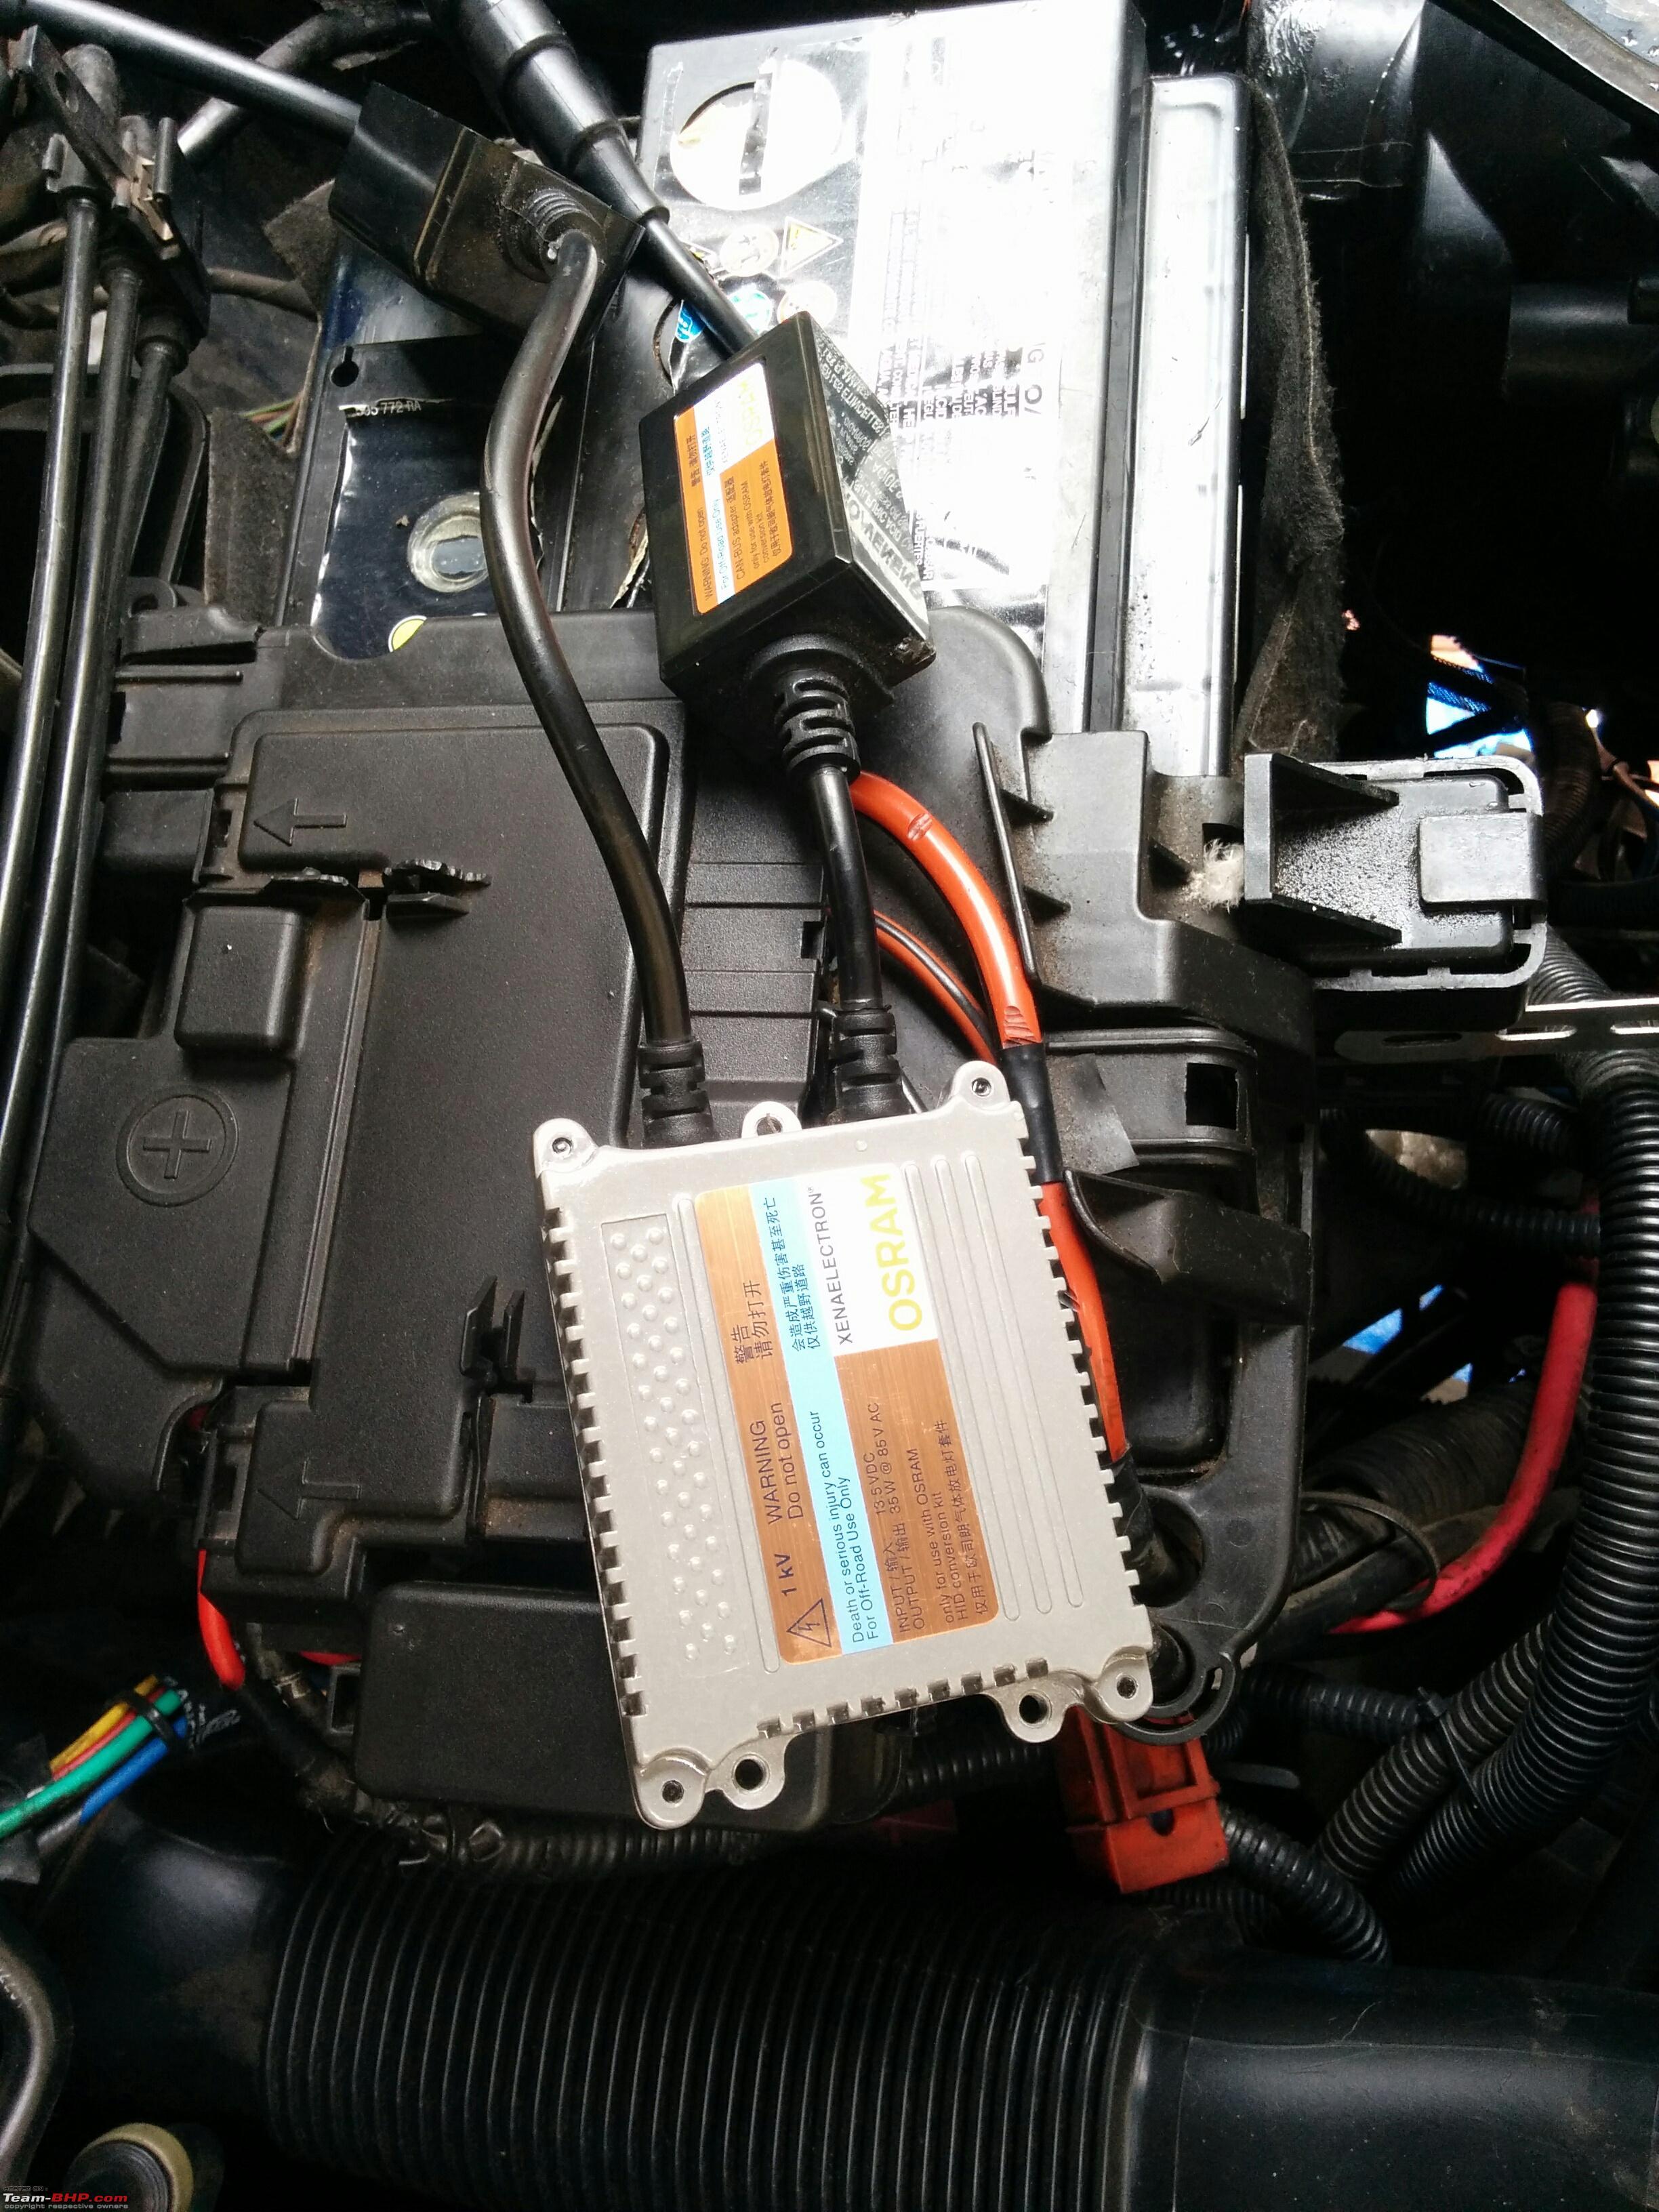 Ford Van Fuse Box Diagram On 86 Ford Ranger Tail Light Wiring Diagram